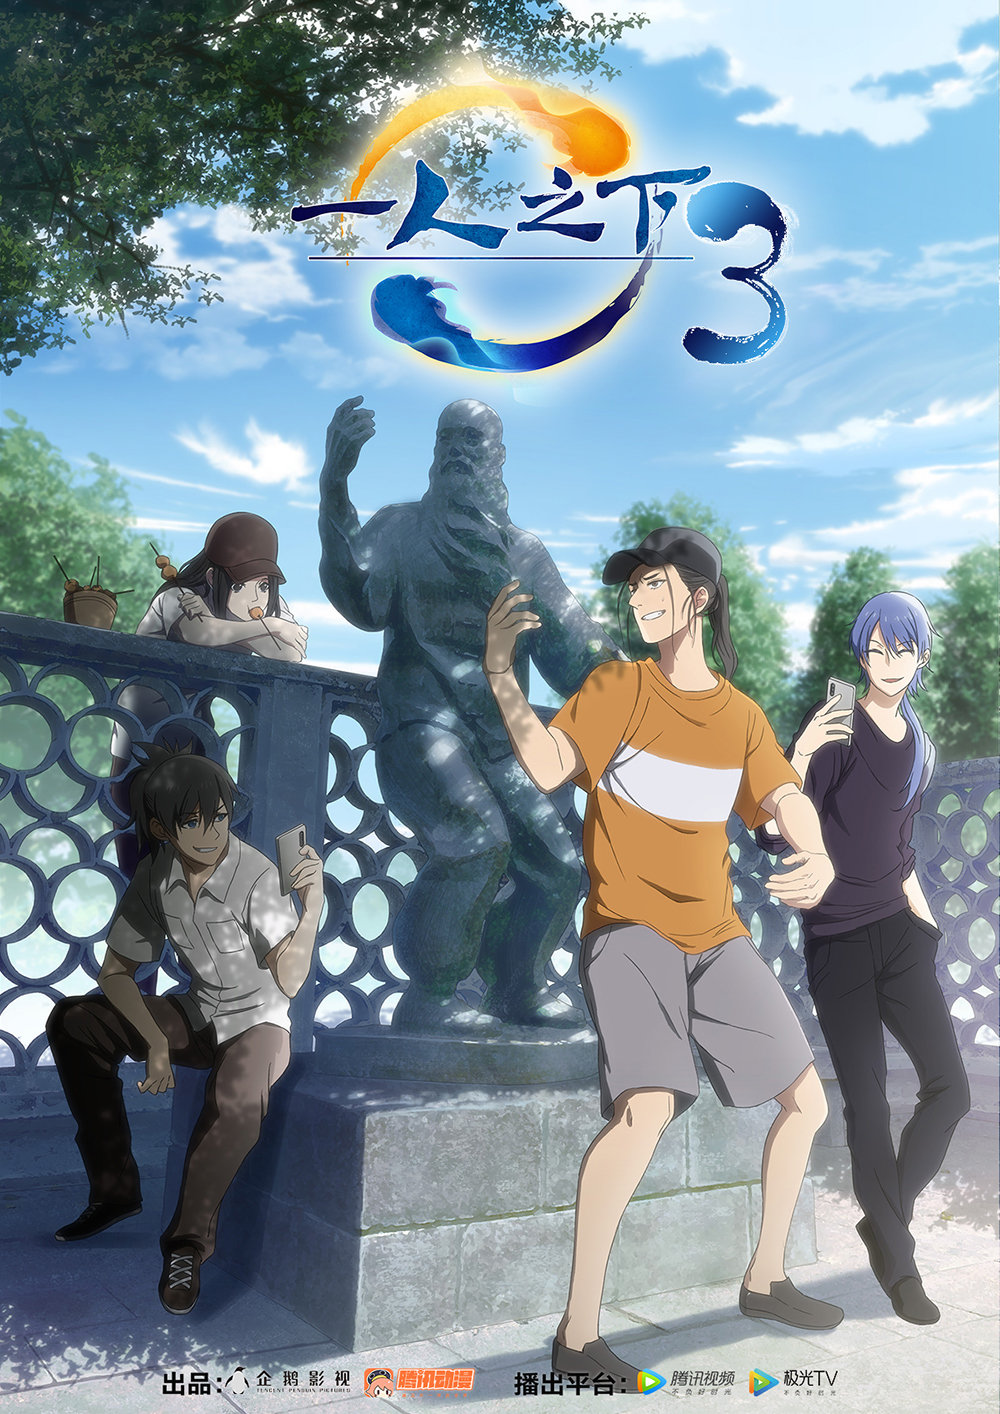 Hitori no Shita: The Outcast 3rd Season, The Outcast 3rd Season, Yi Ren Zhi Xia 3rd Season, Under One Person 3rd Season ,تحت شخص واحد: المنبوذ, 一人之下 第三季